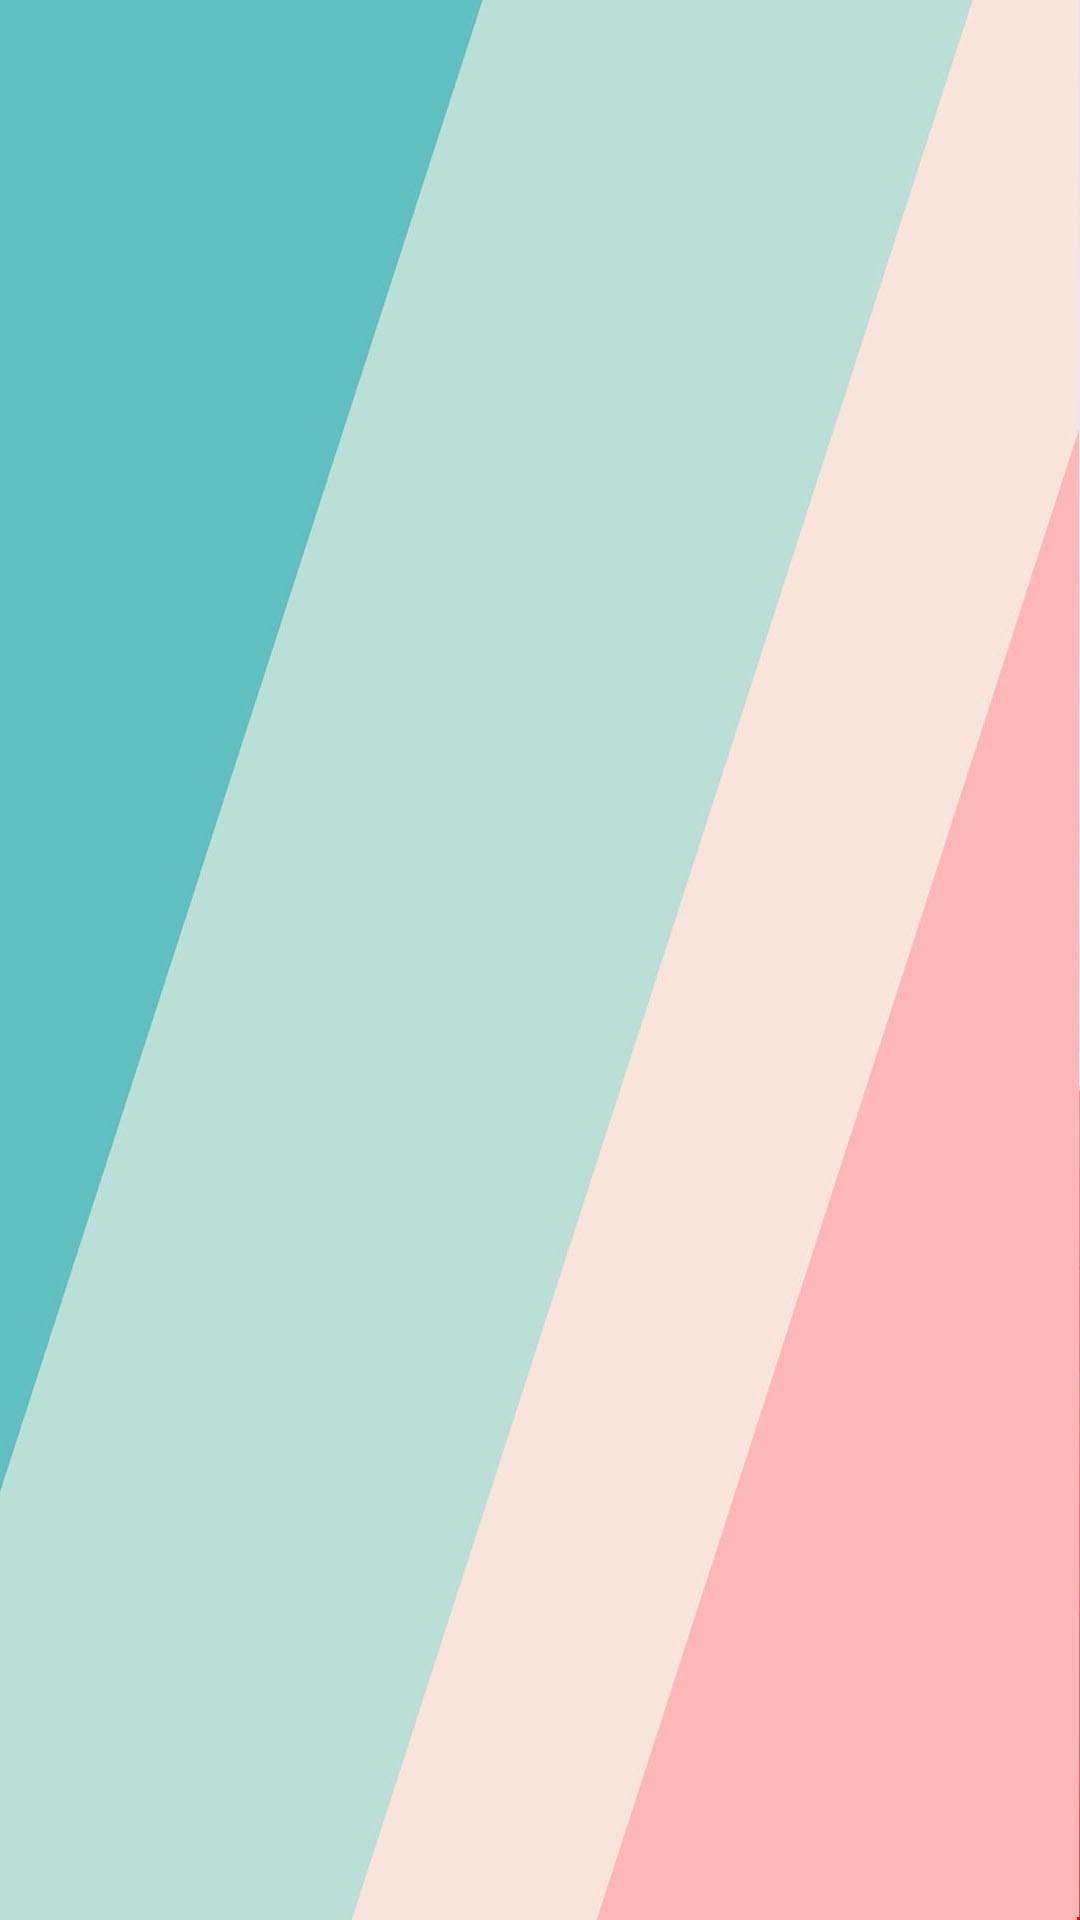 Wallpaper turquoise & pink